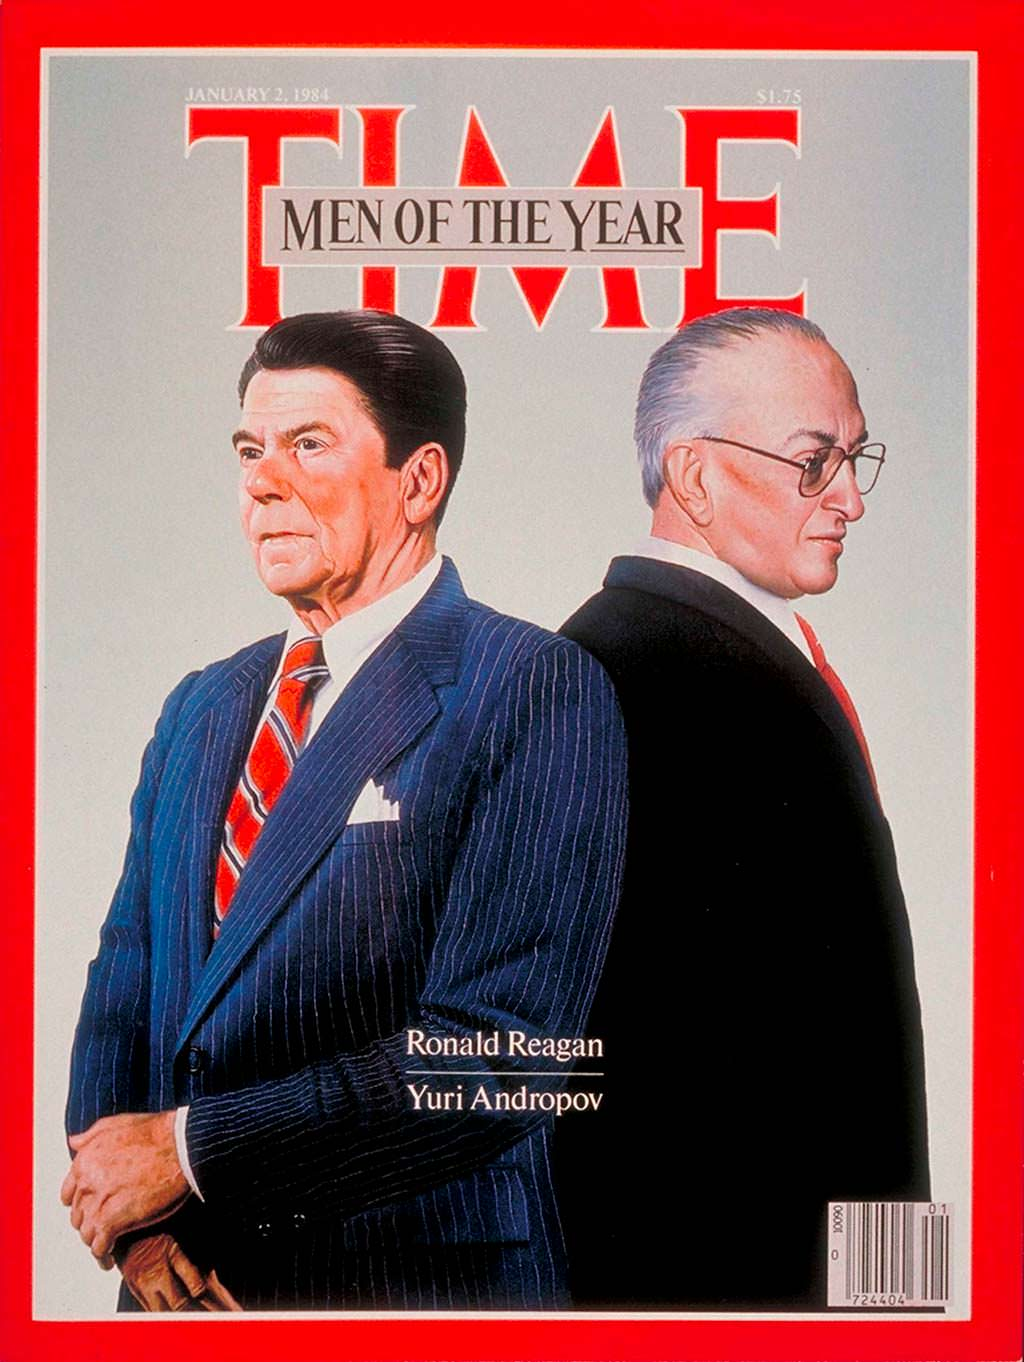 1983 год. Рональд Рейган и Юрий Андропов на обложке Time